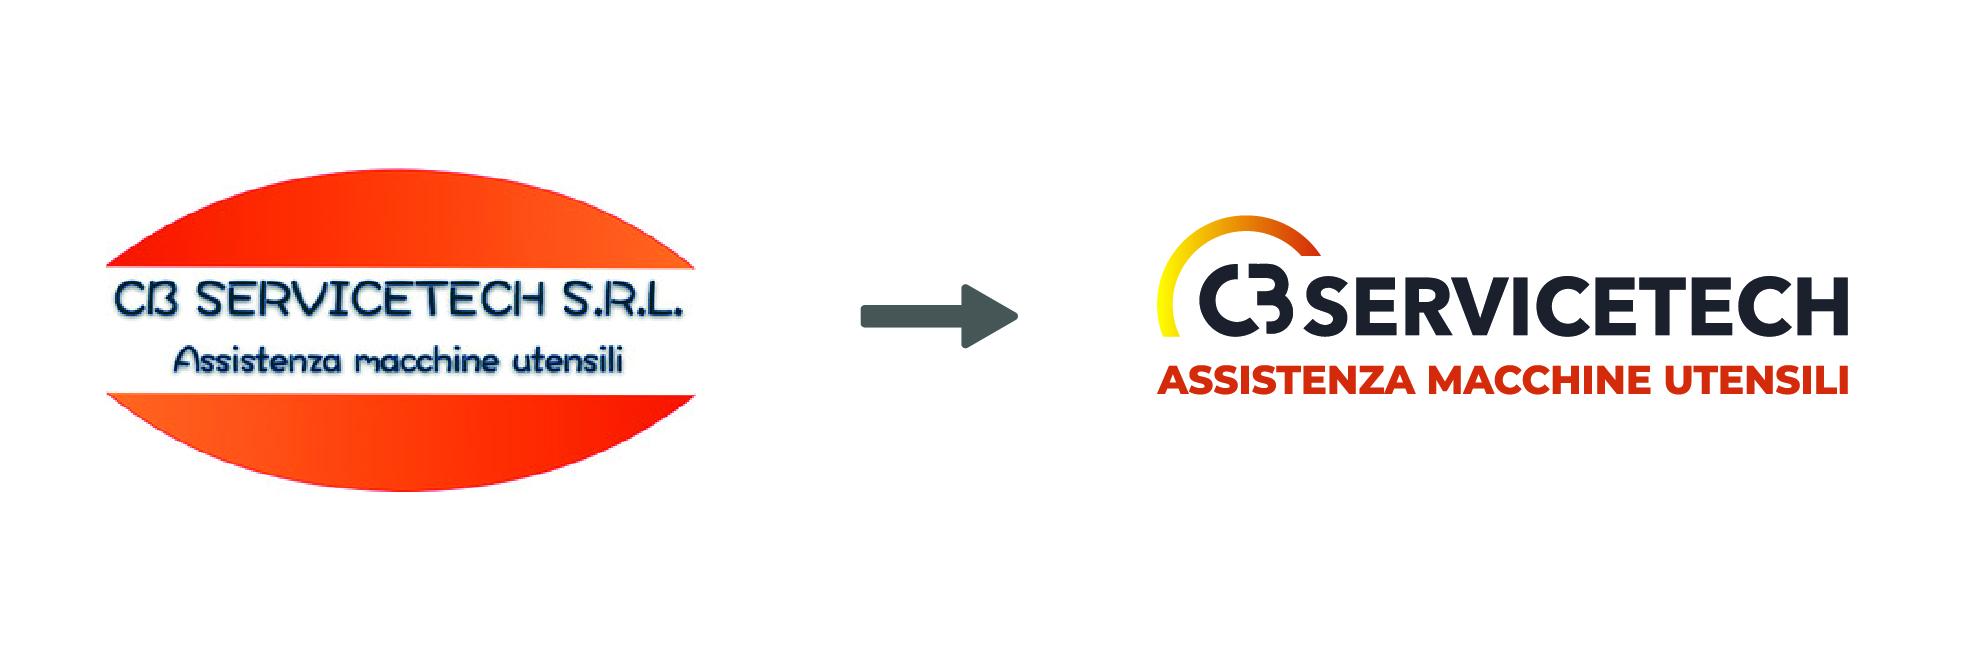 Luca Forlani Graphic Design CB ServiceTech img logo 6